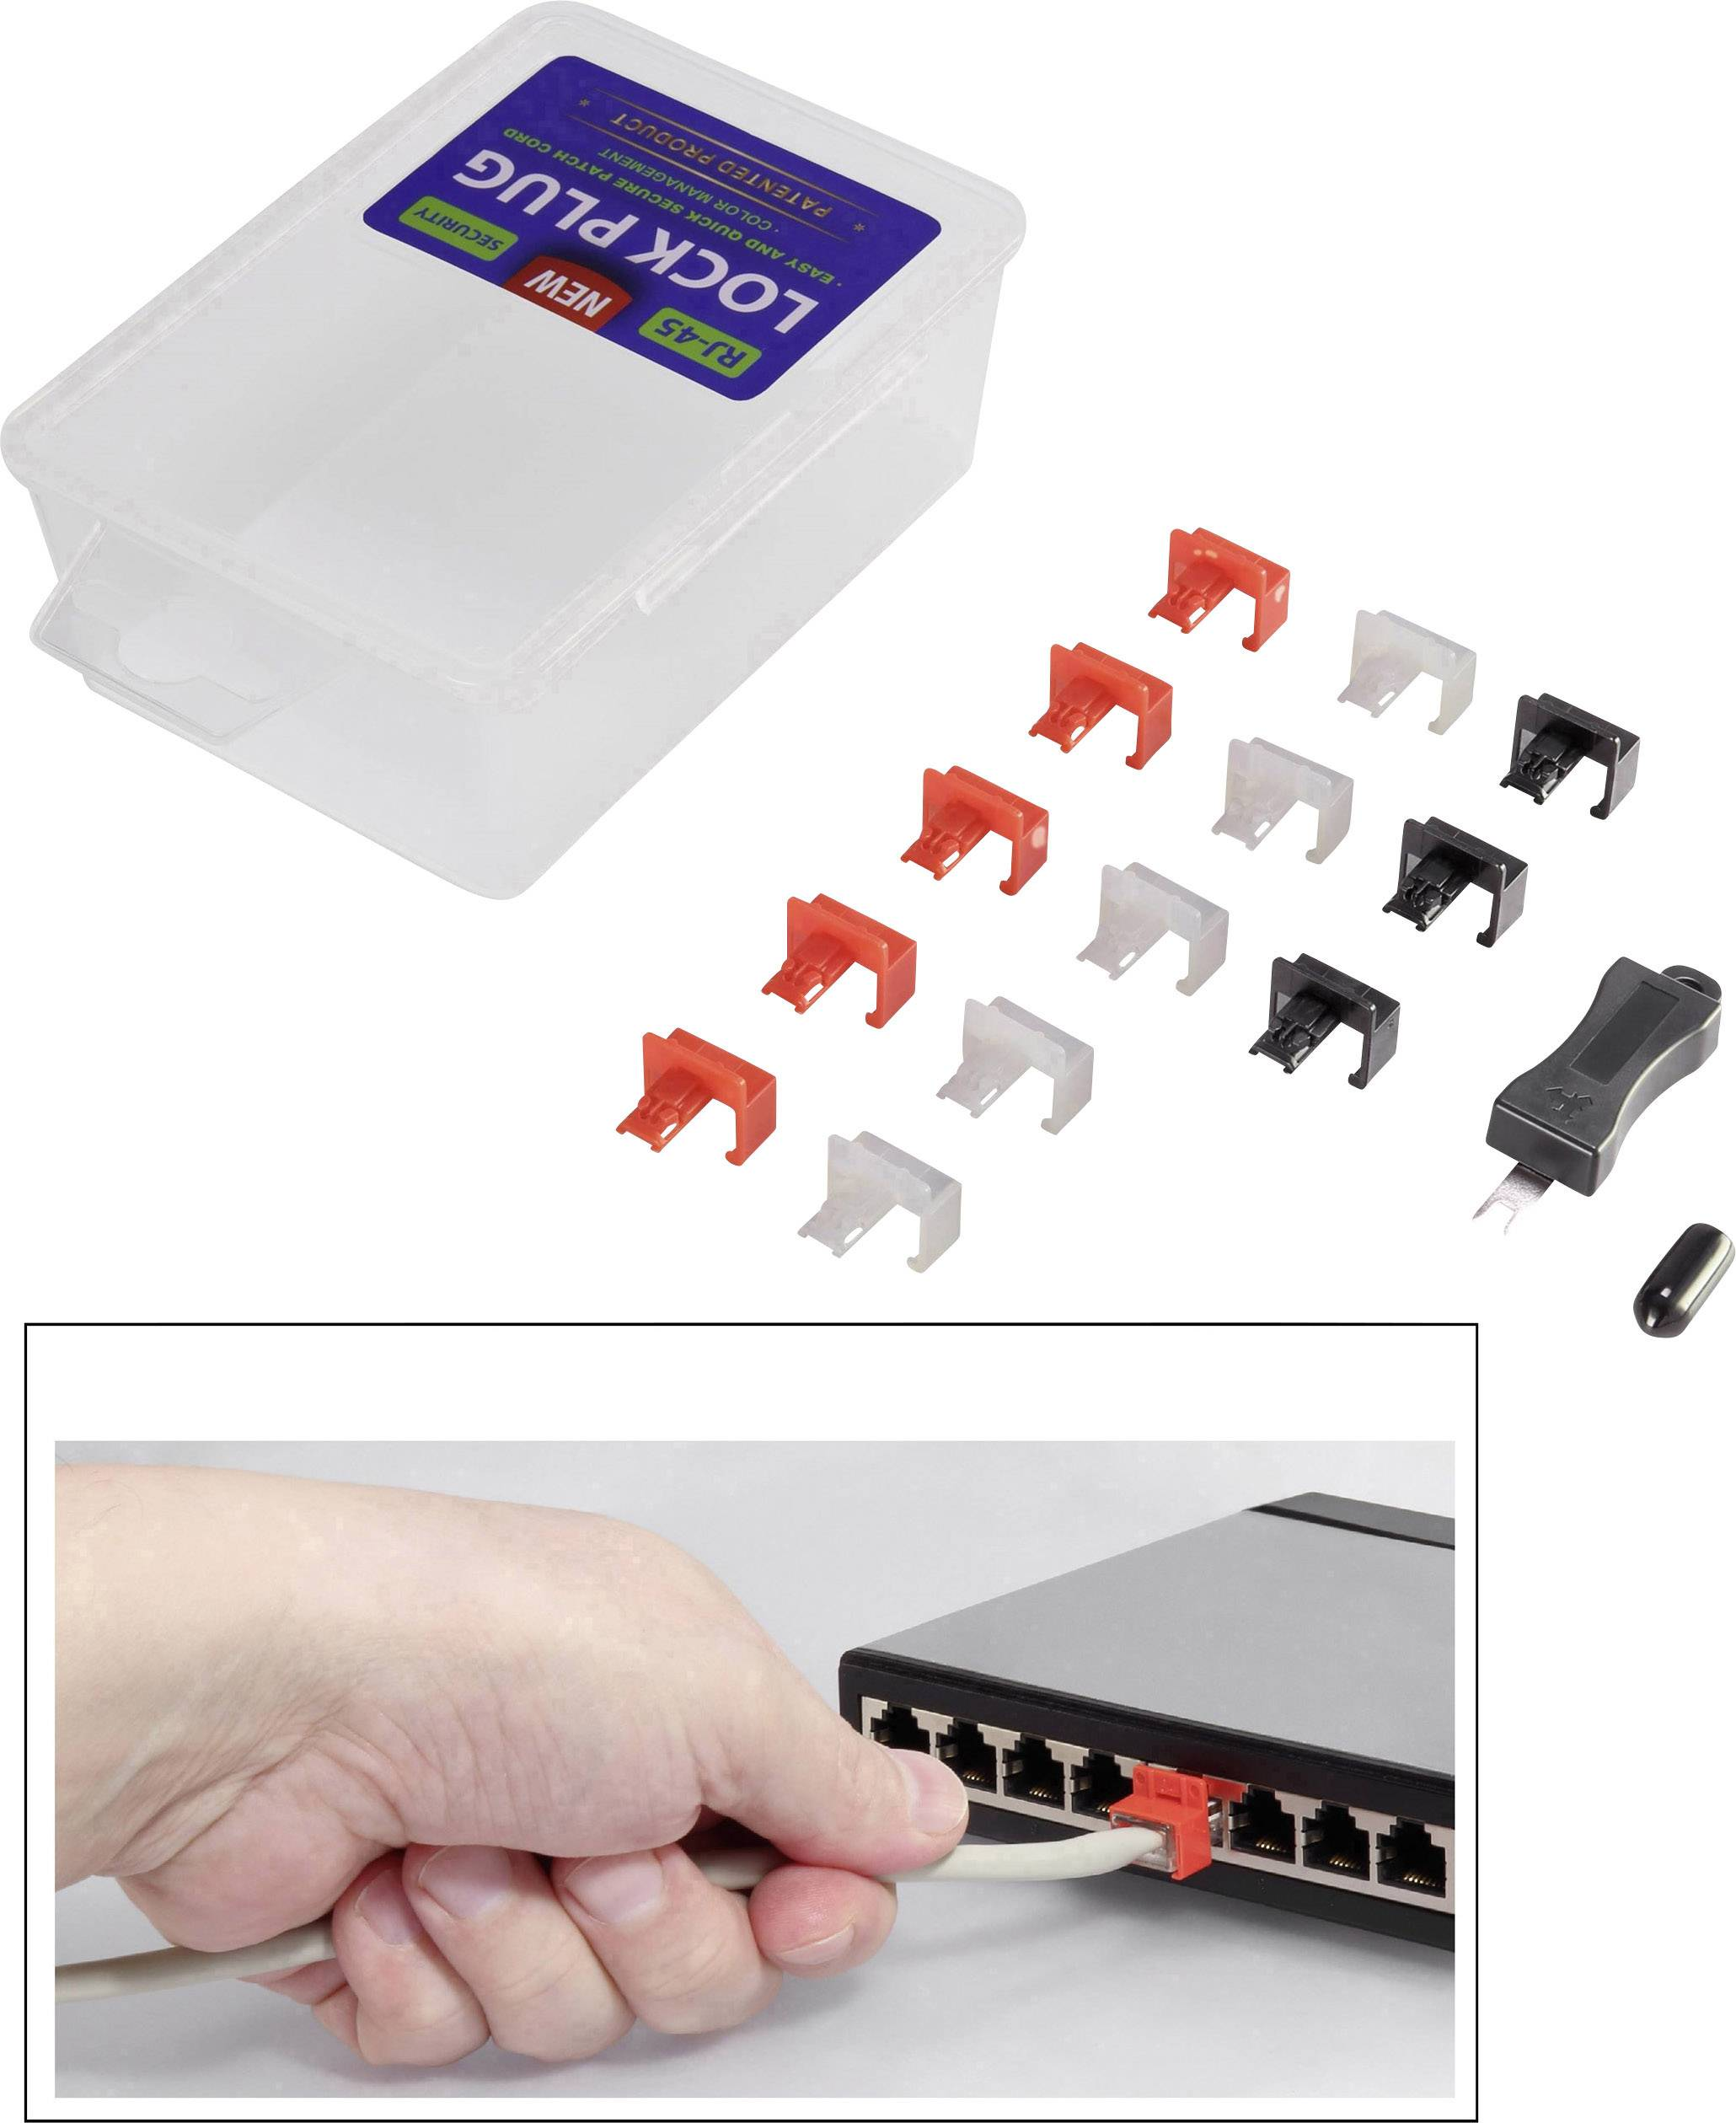 Renkforce západkami security clip sada RF NW-SC (30 ks) RF-NW-SC černá, červená, bílá Renkforce RF-4861899 30 ks